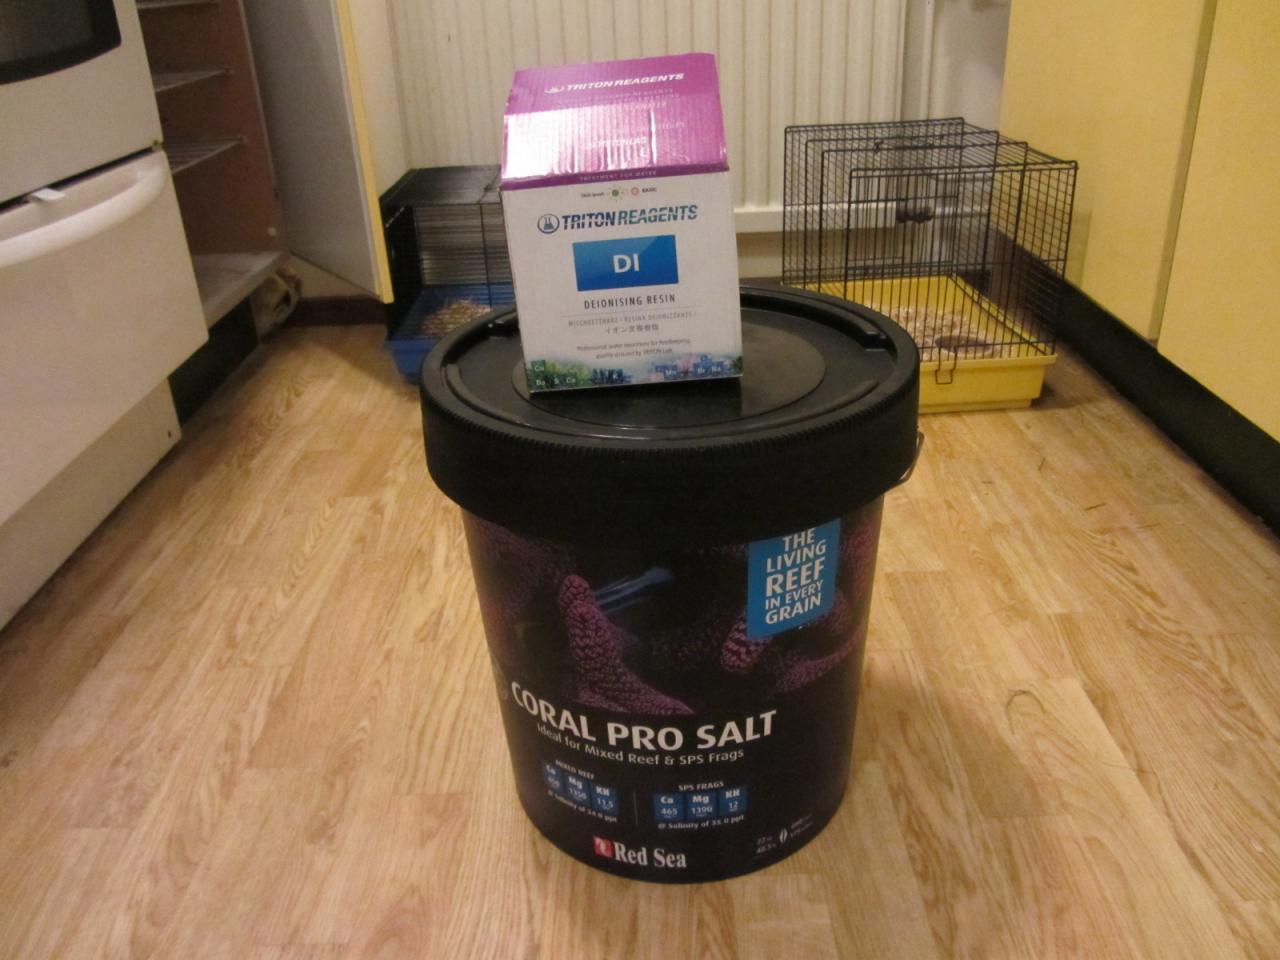 Salt.JPG.7b4020aaa62b1be6bbf0ddfb8de8b0aa.JPG